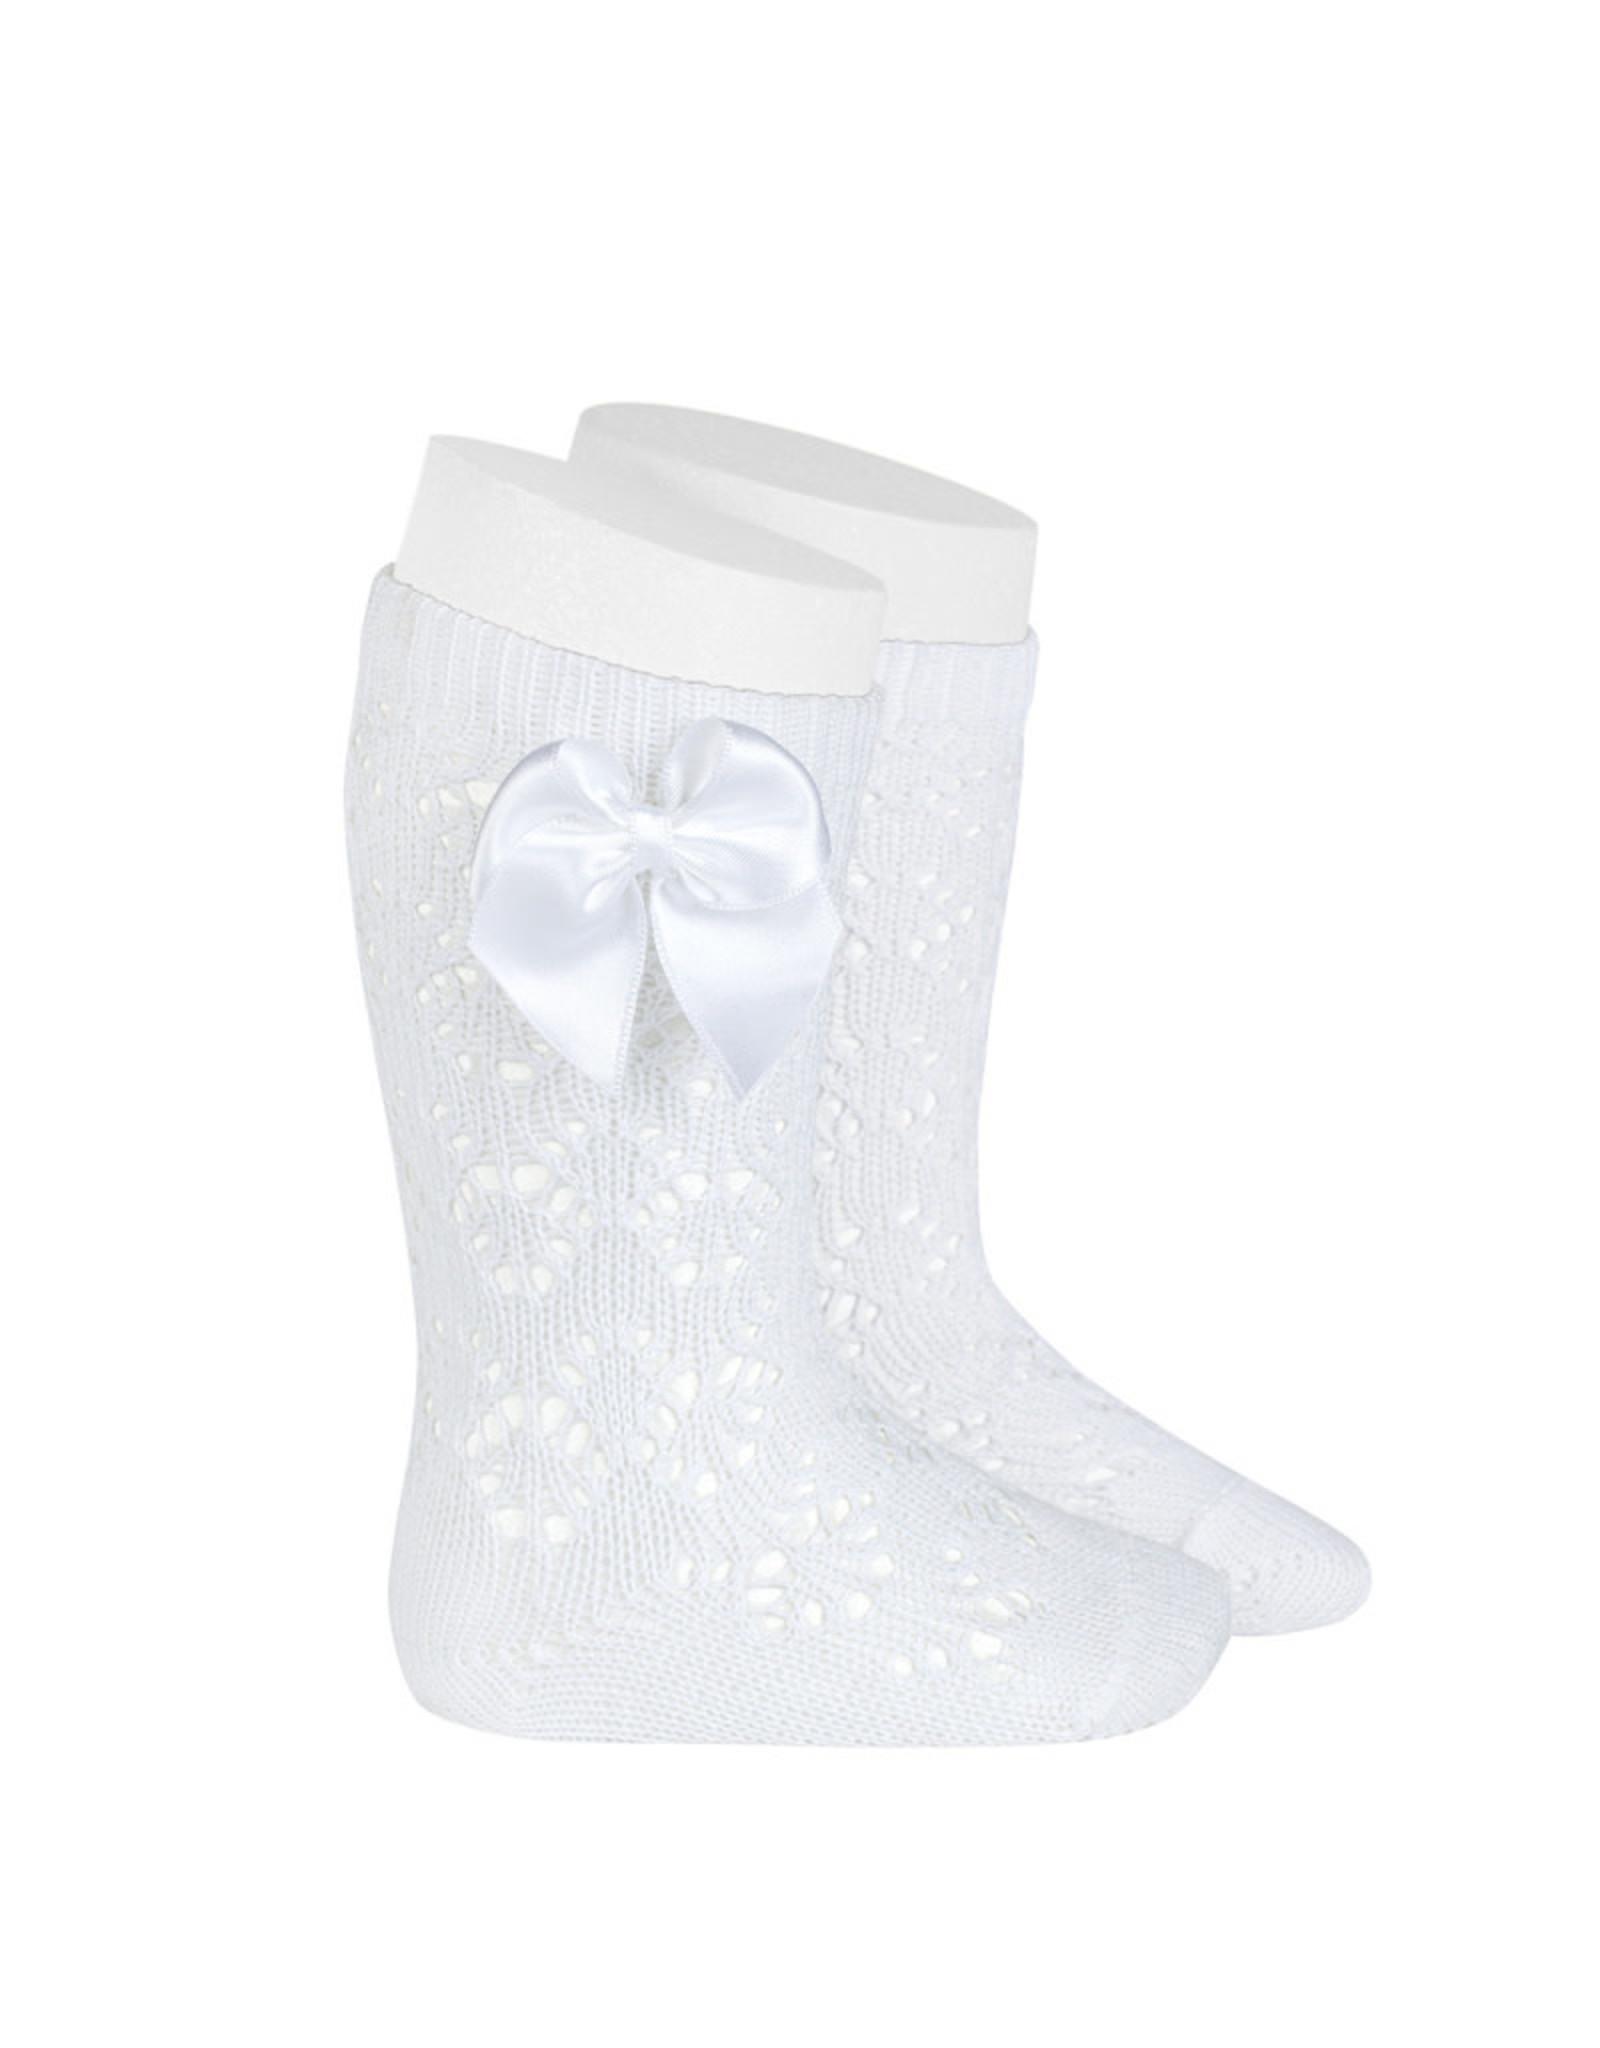 CONDOR White Geometric Socks with Bow